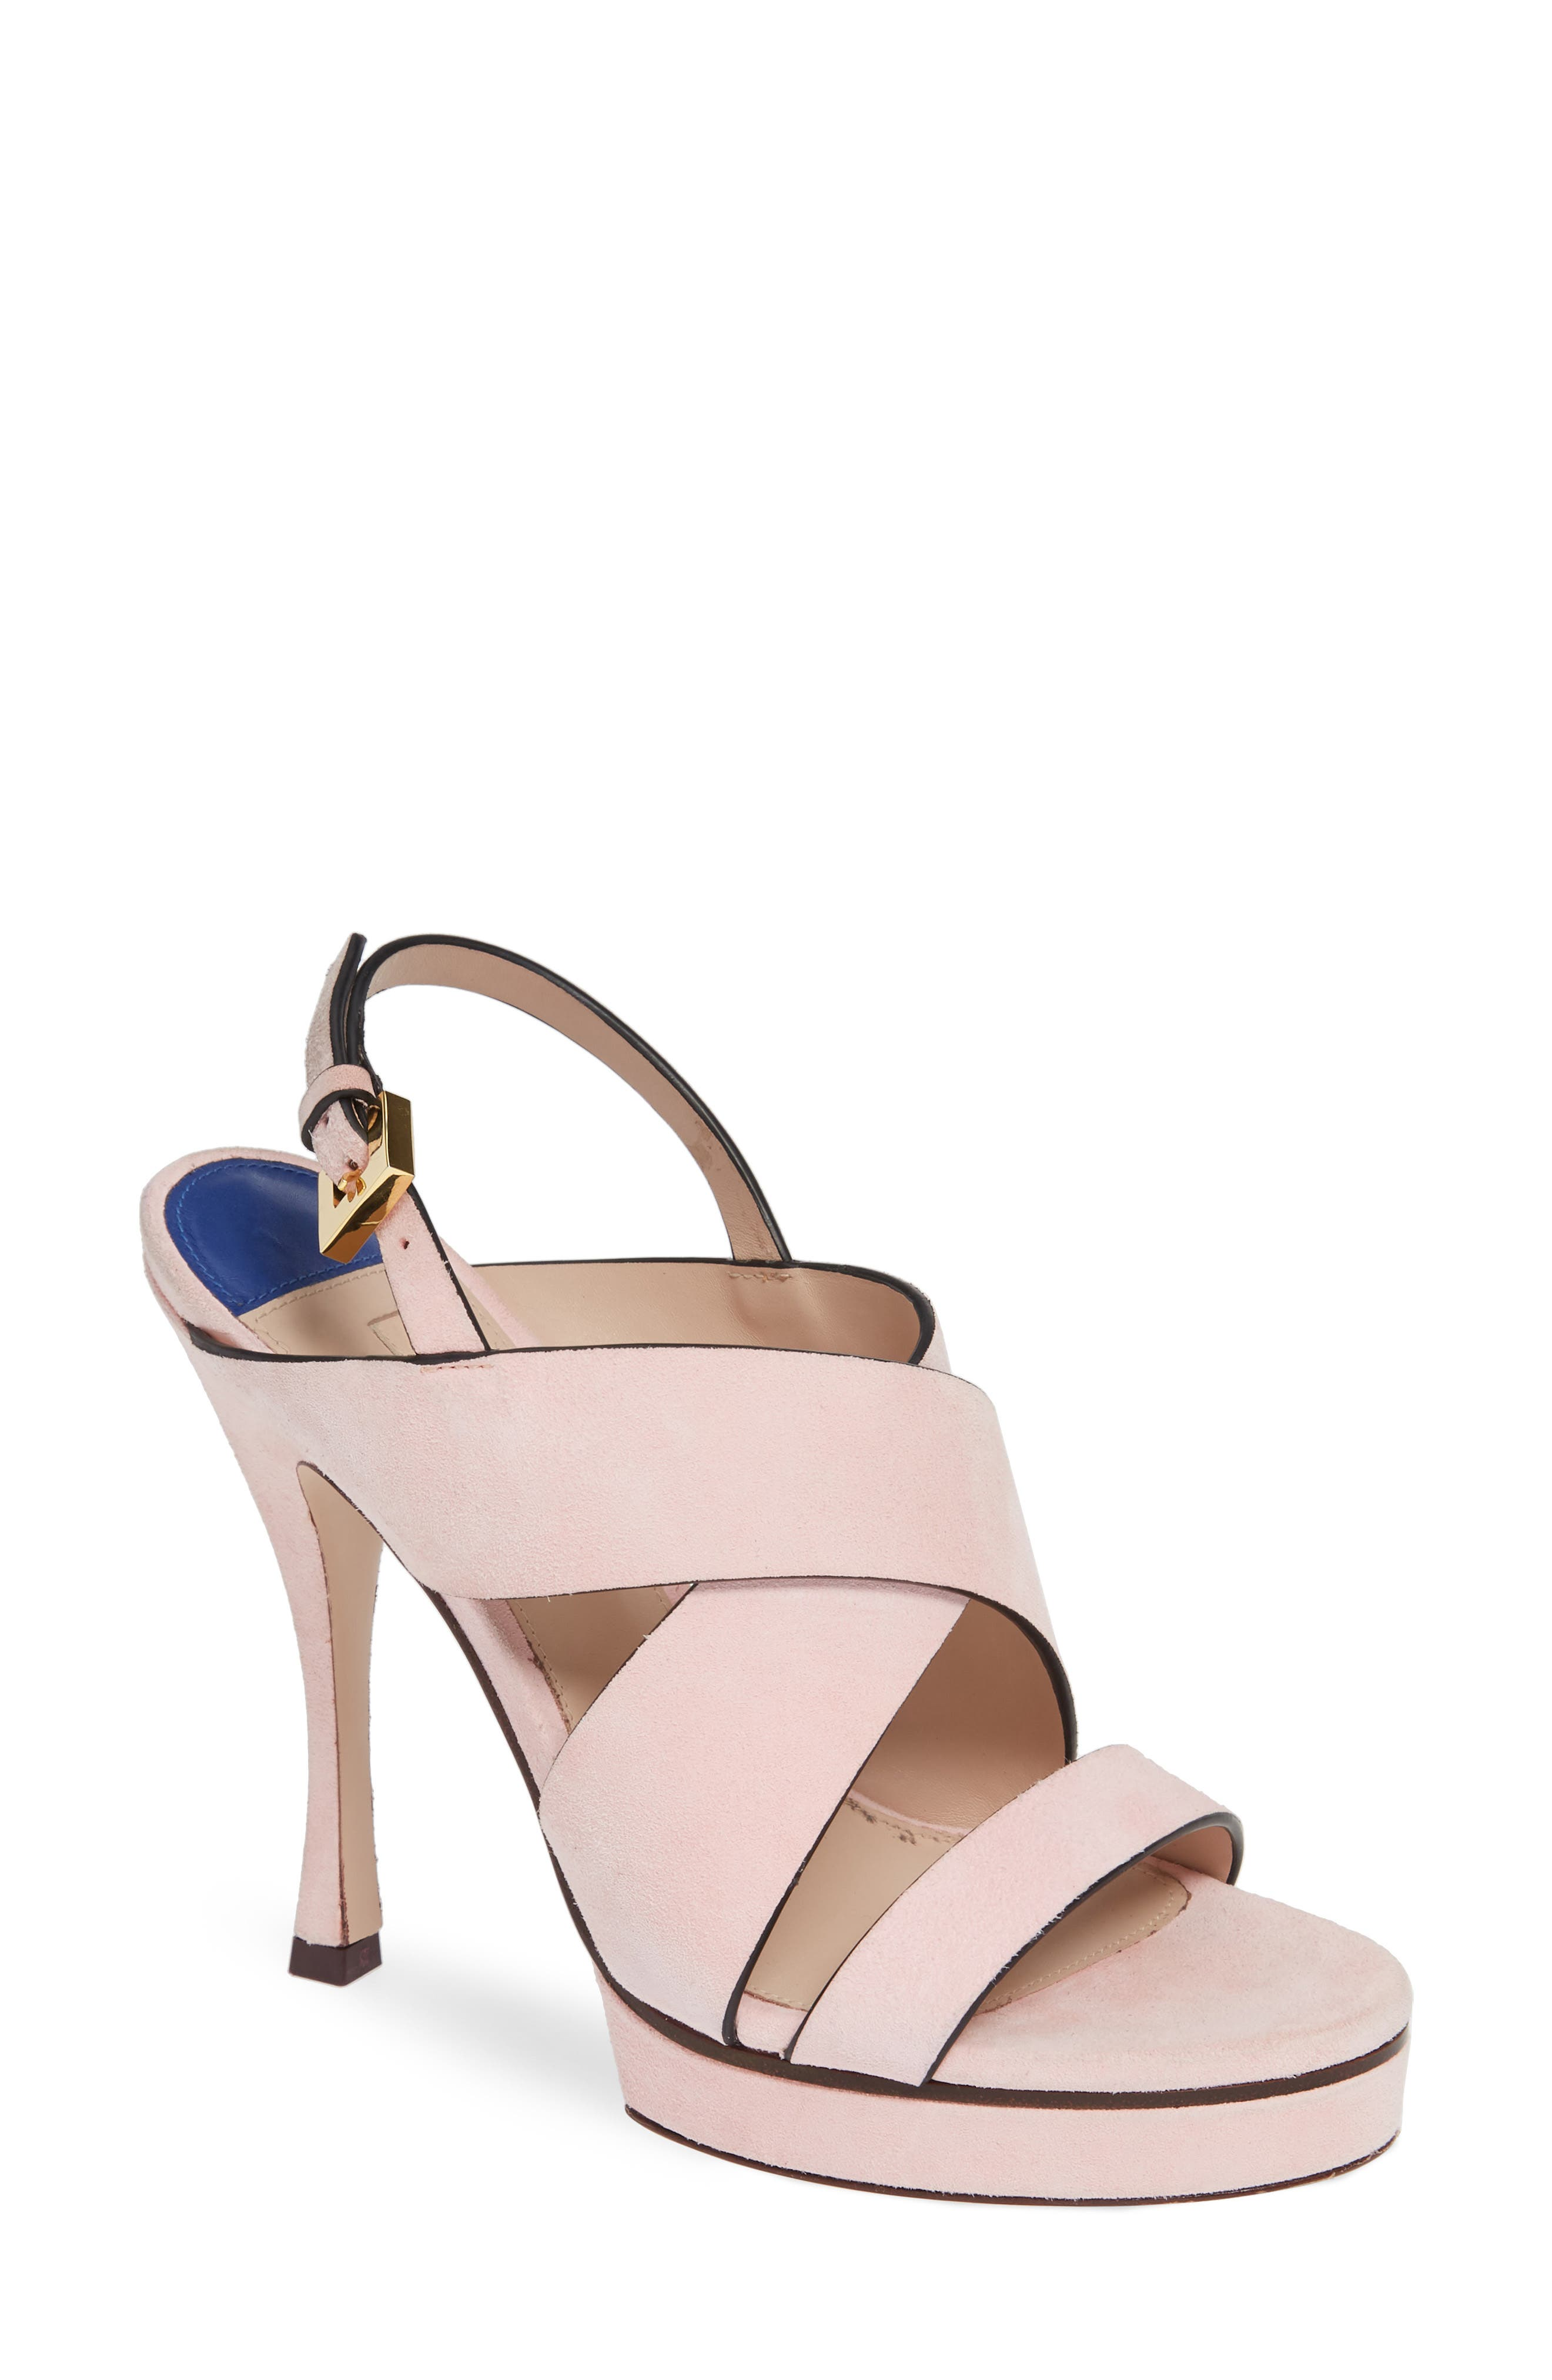 Stuart Weitzman Hester Cross Strap Sandal, Pink